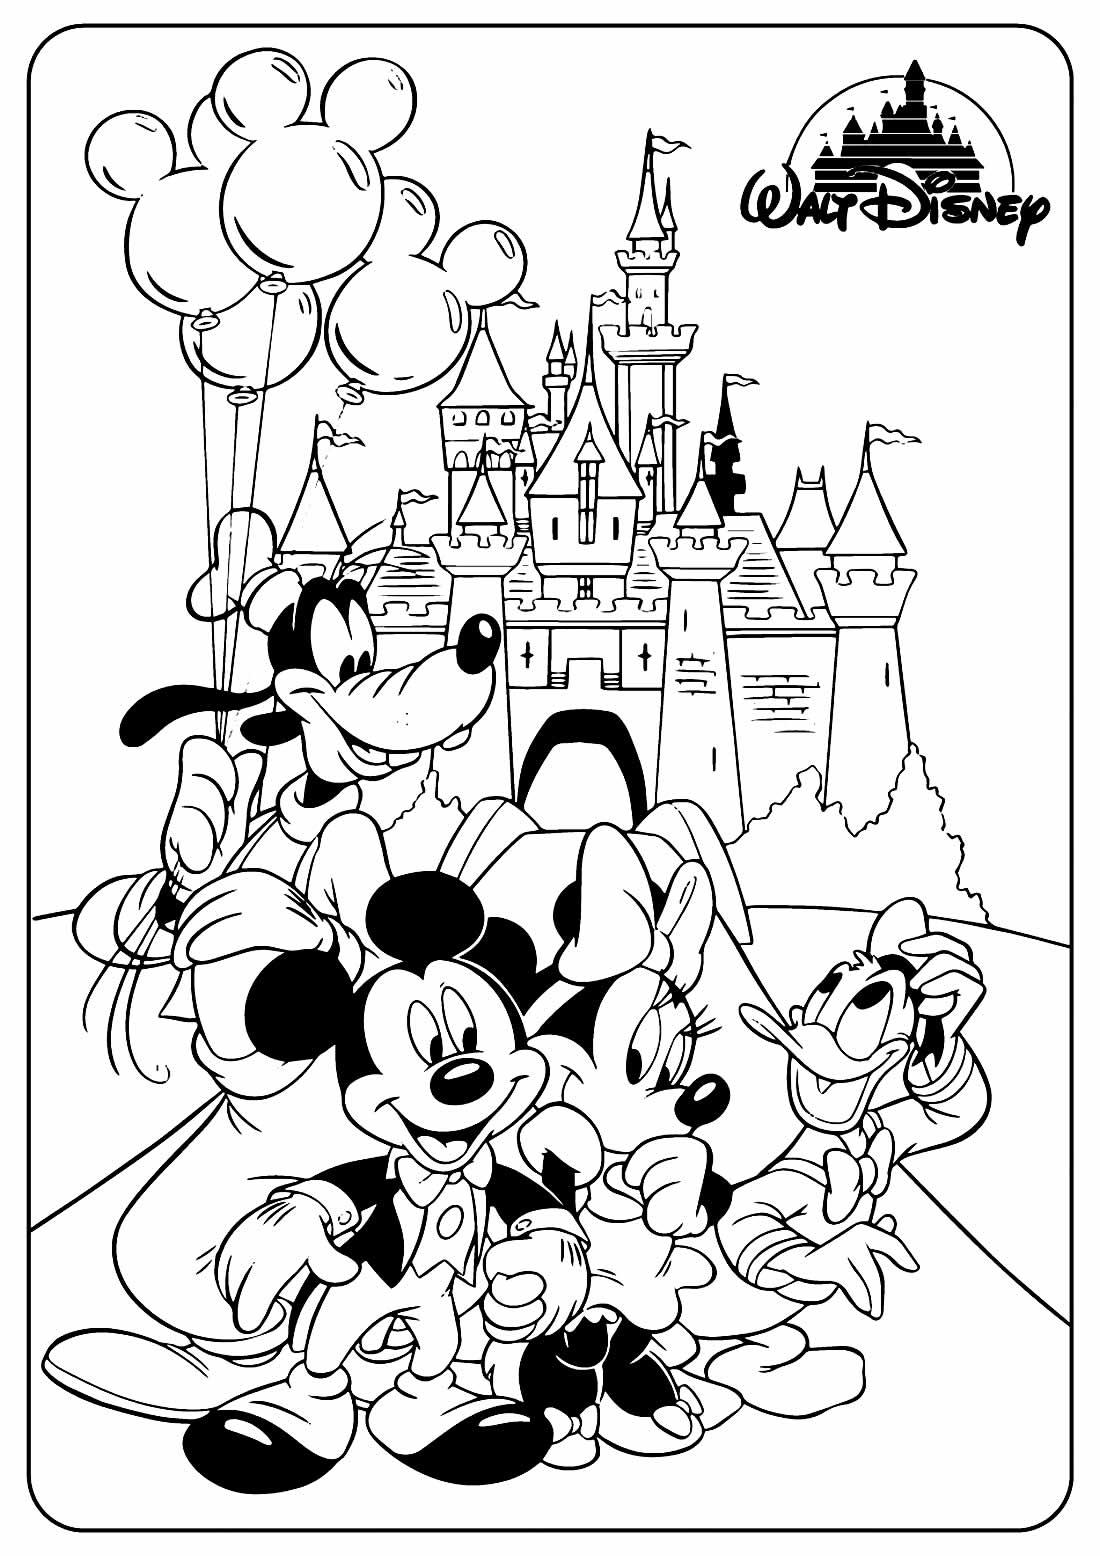 Imagem para colorir do Mickey Mouse